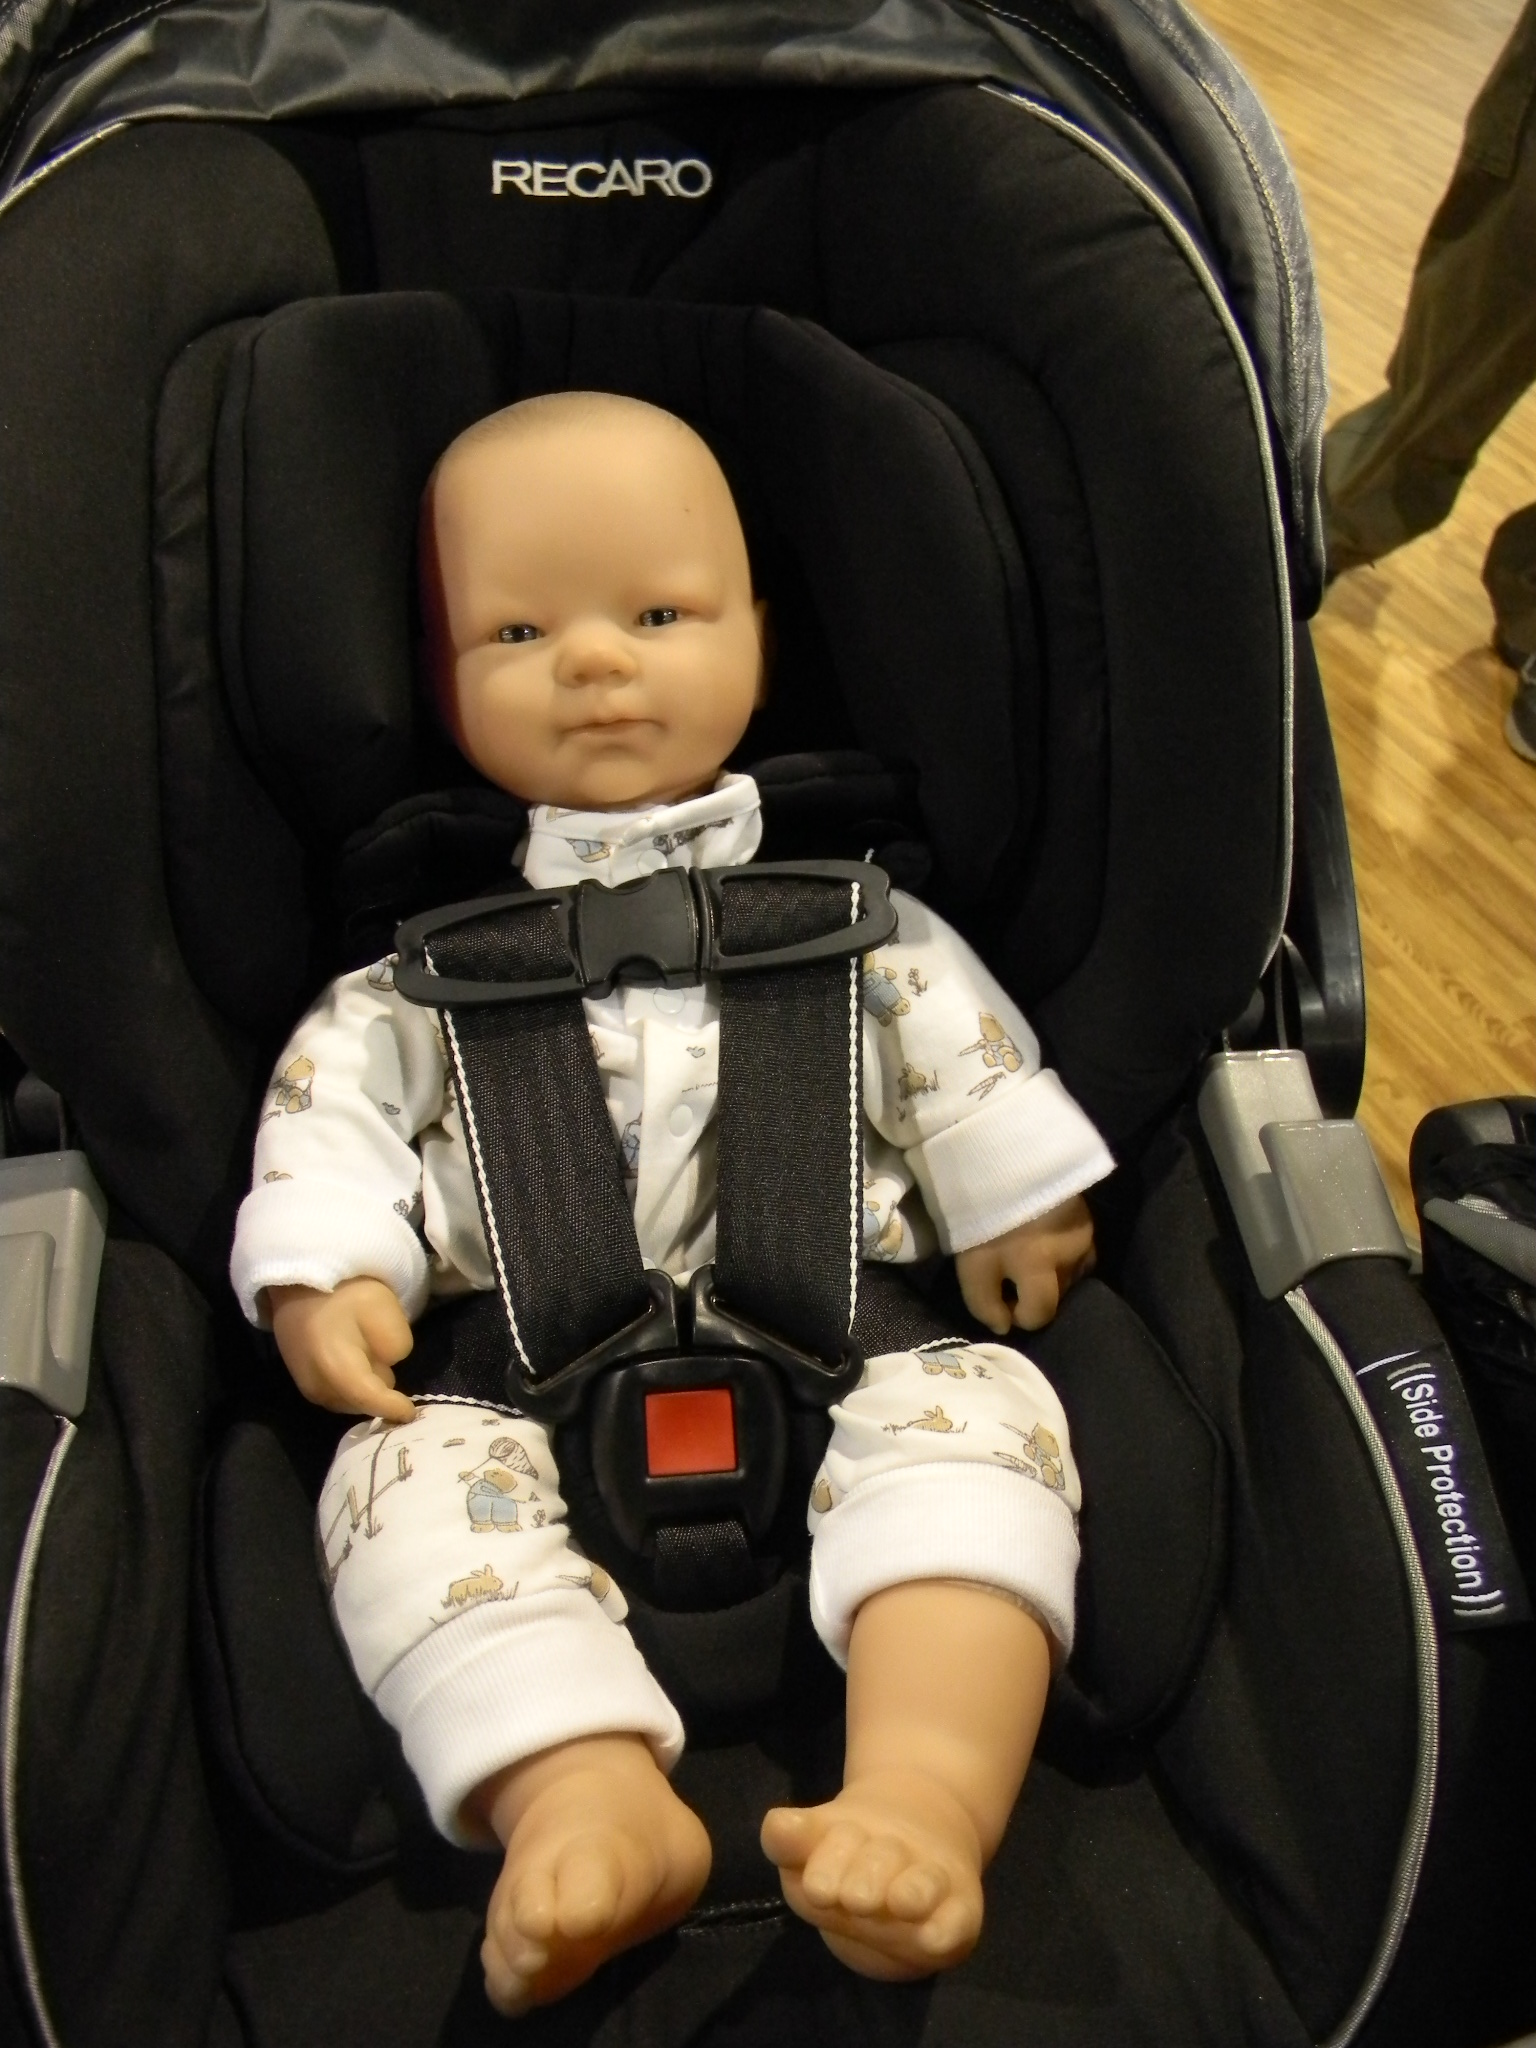 Recaro Guardia Infant Seat